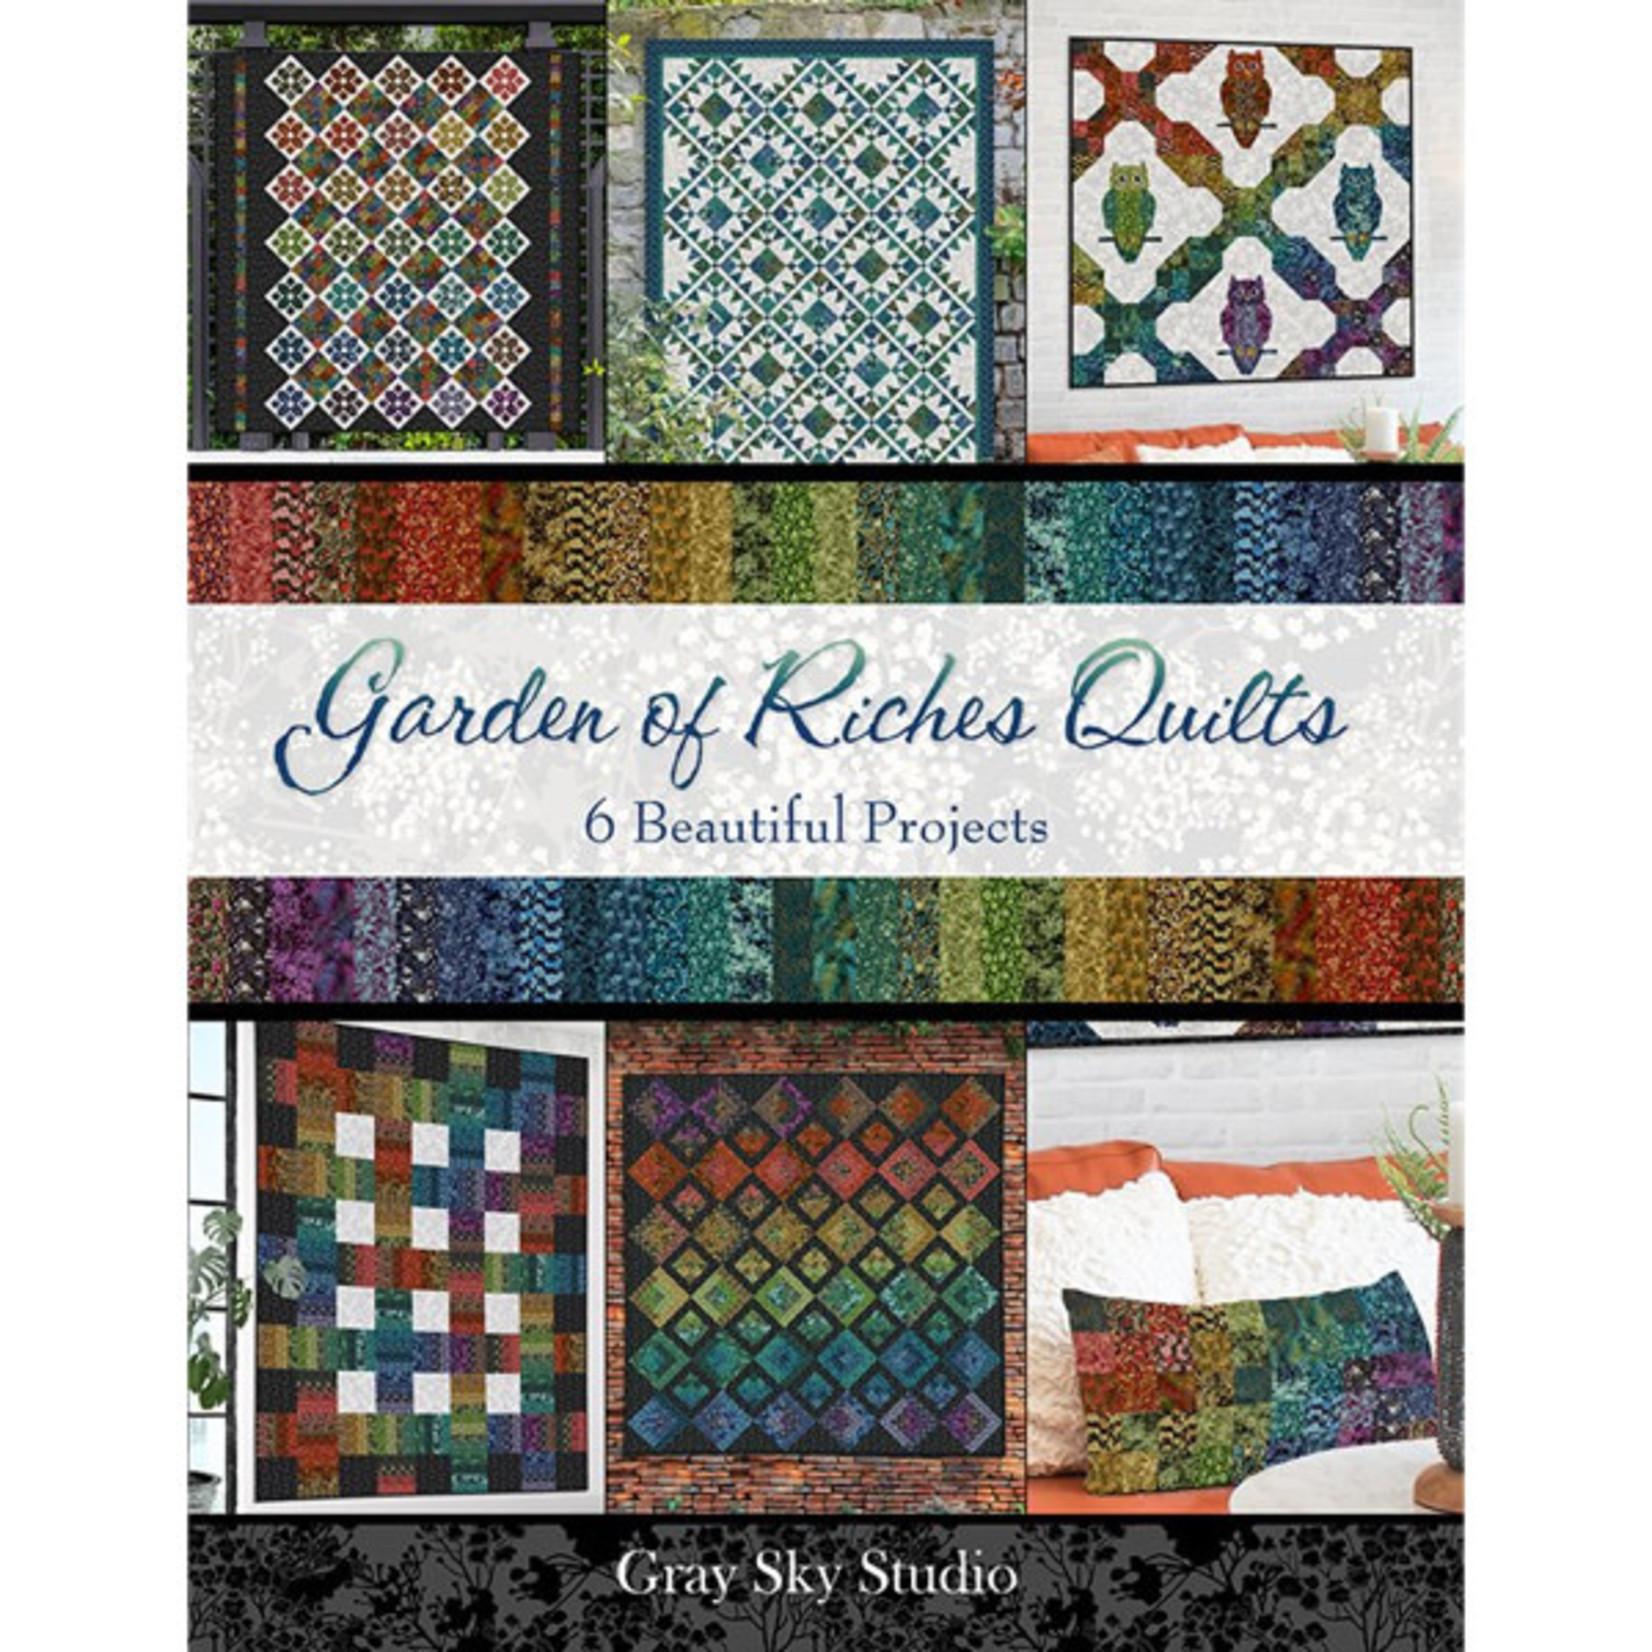 Garden of Riches Quilts - Jason Yenter